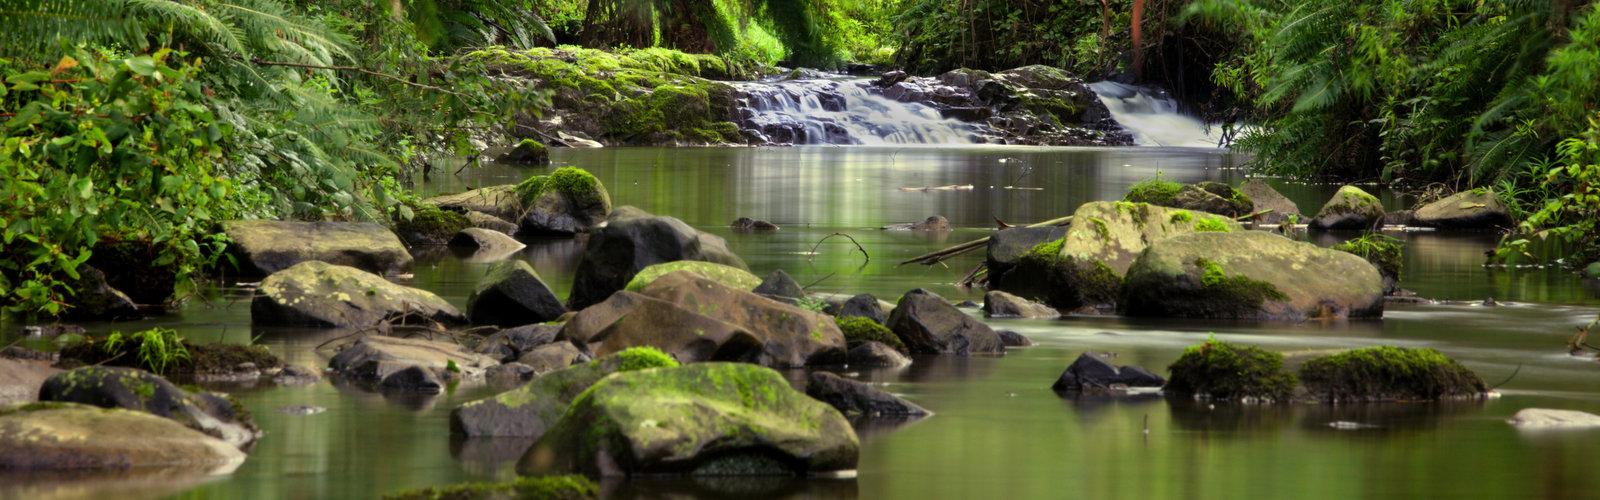 Turtons Creek Reserve